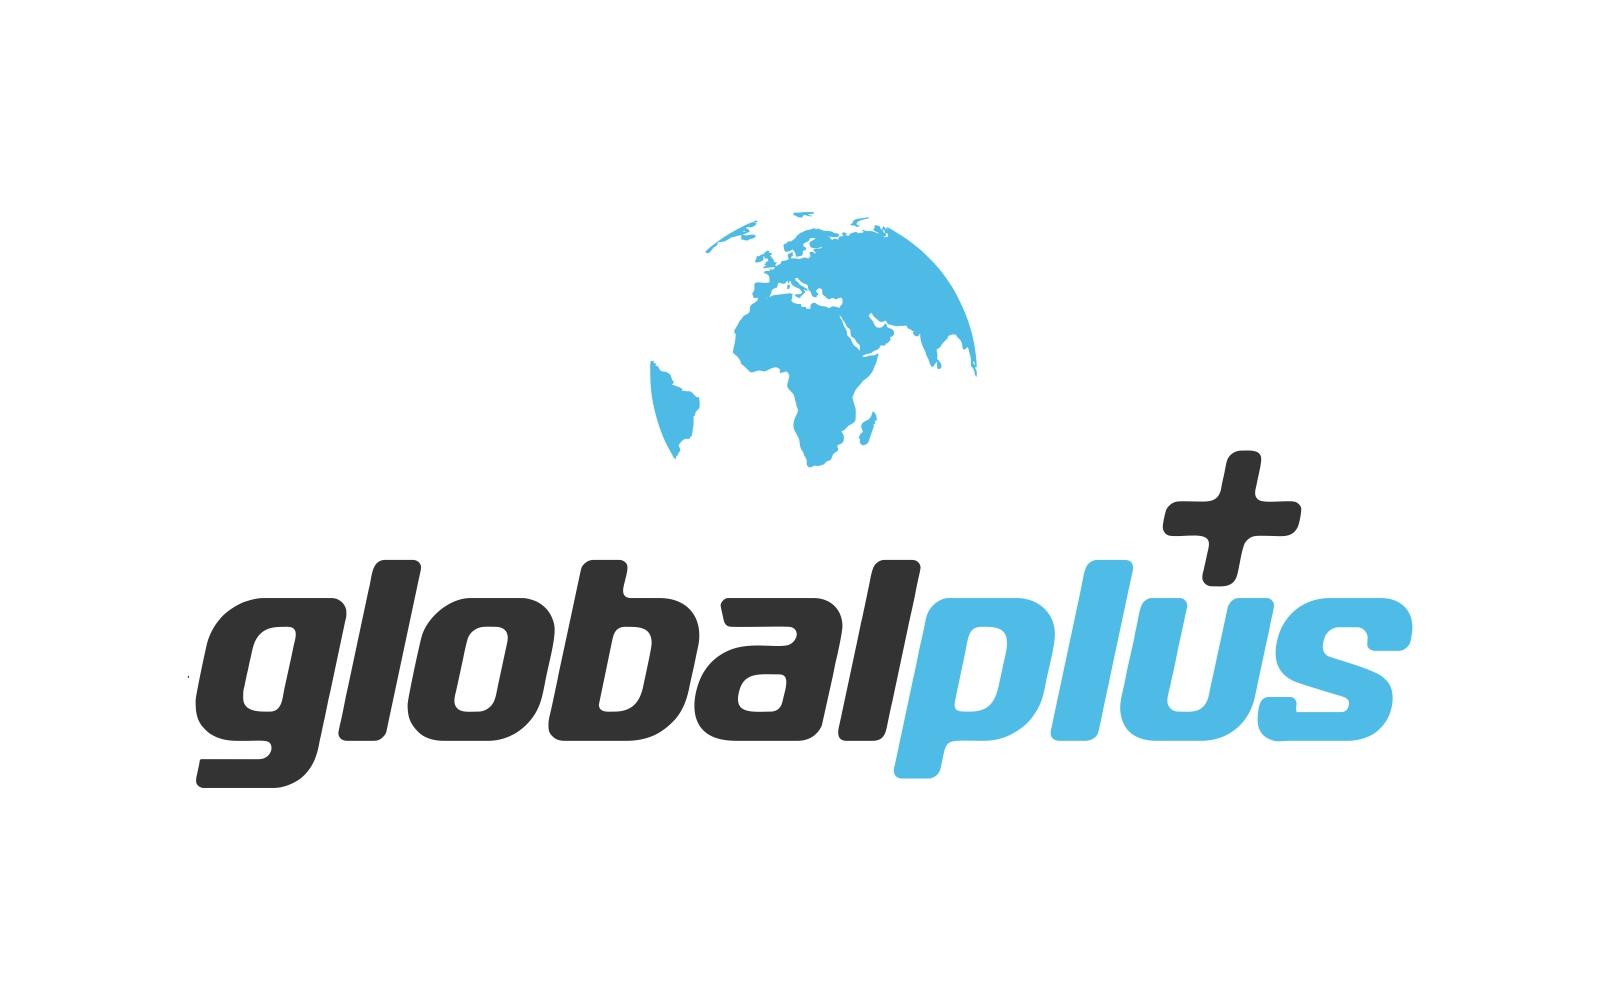 Globalplus